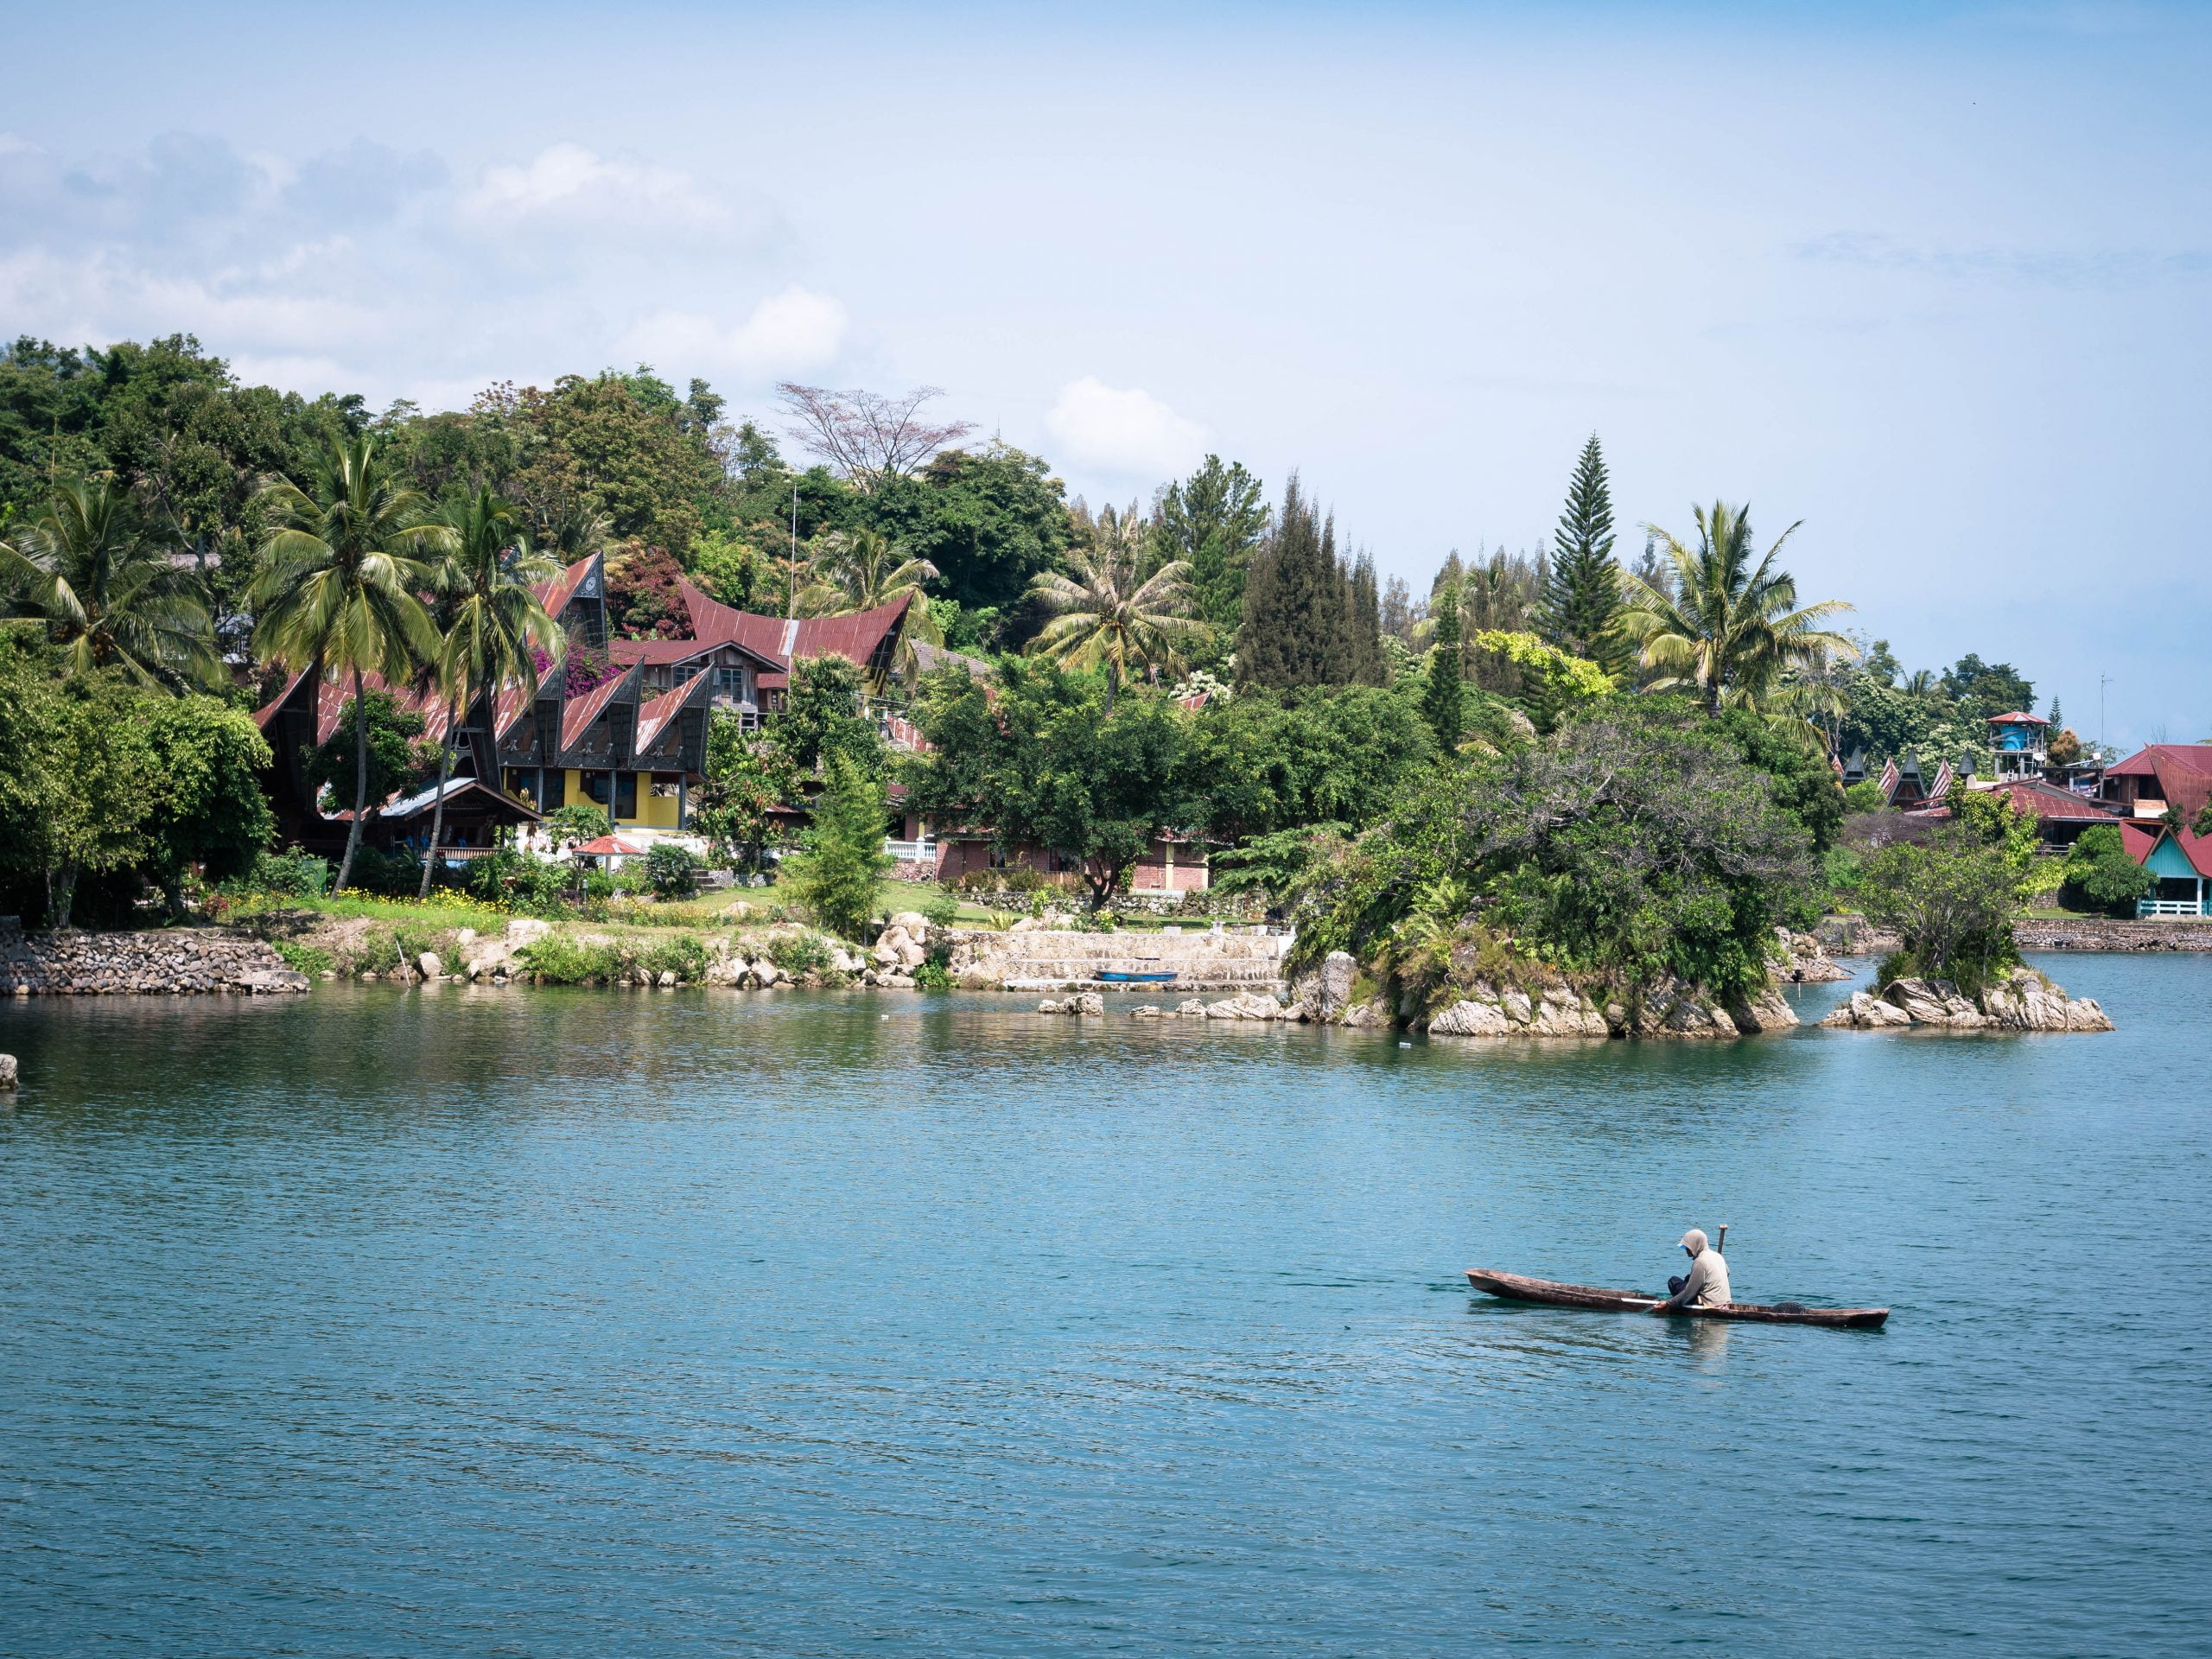 lac toba canoé scaled - Les globe blogueurs - blog voyage nature